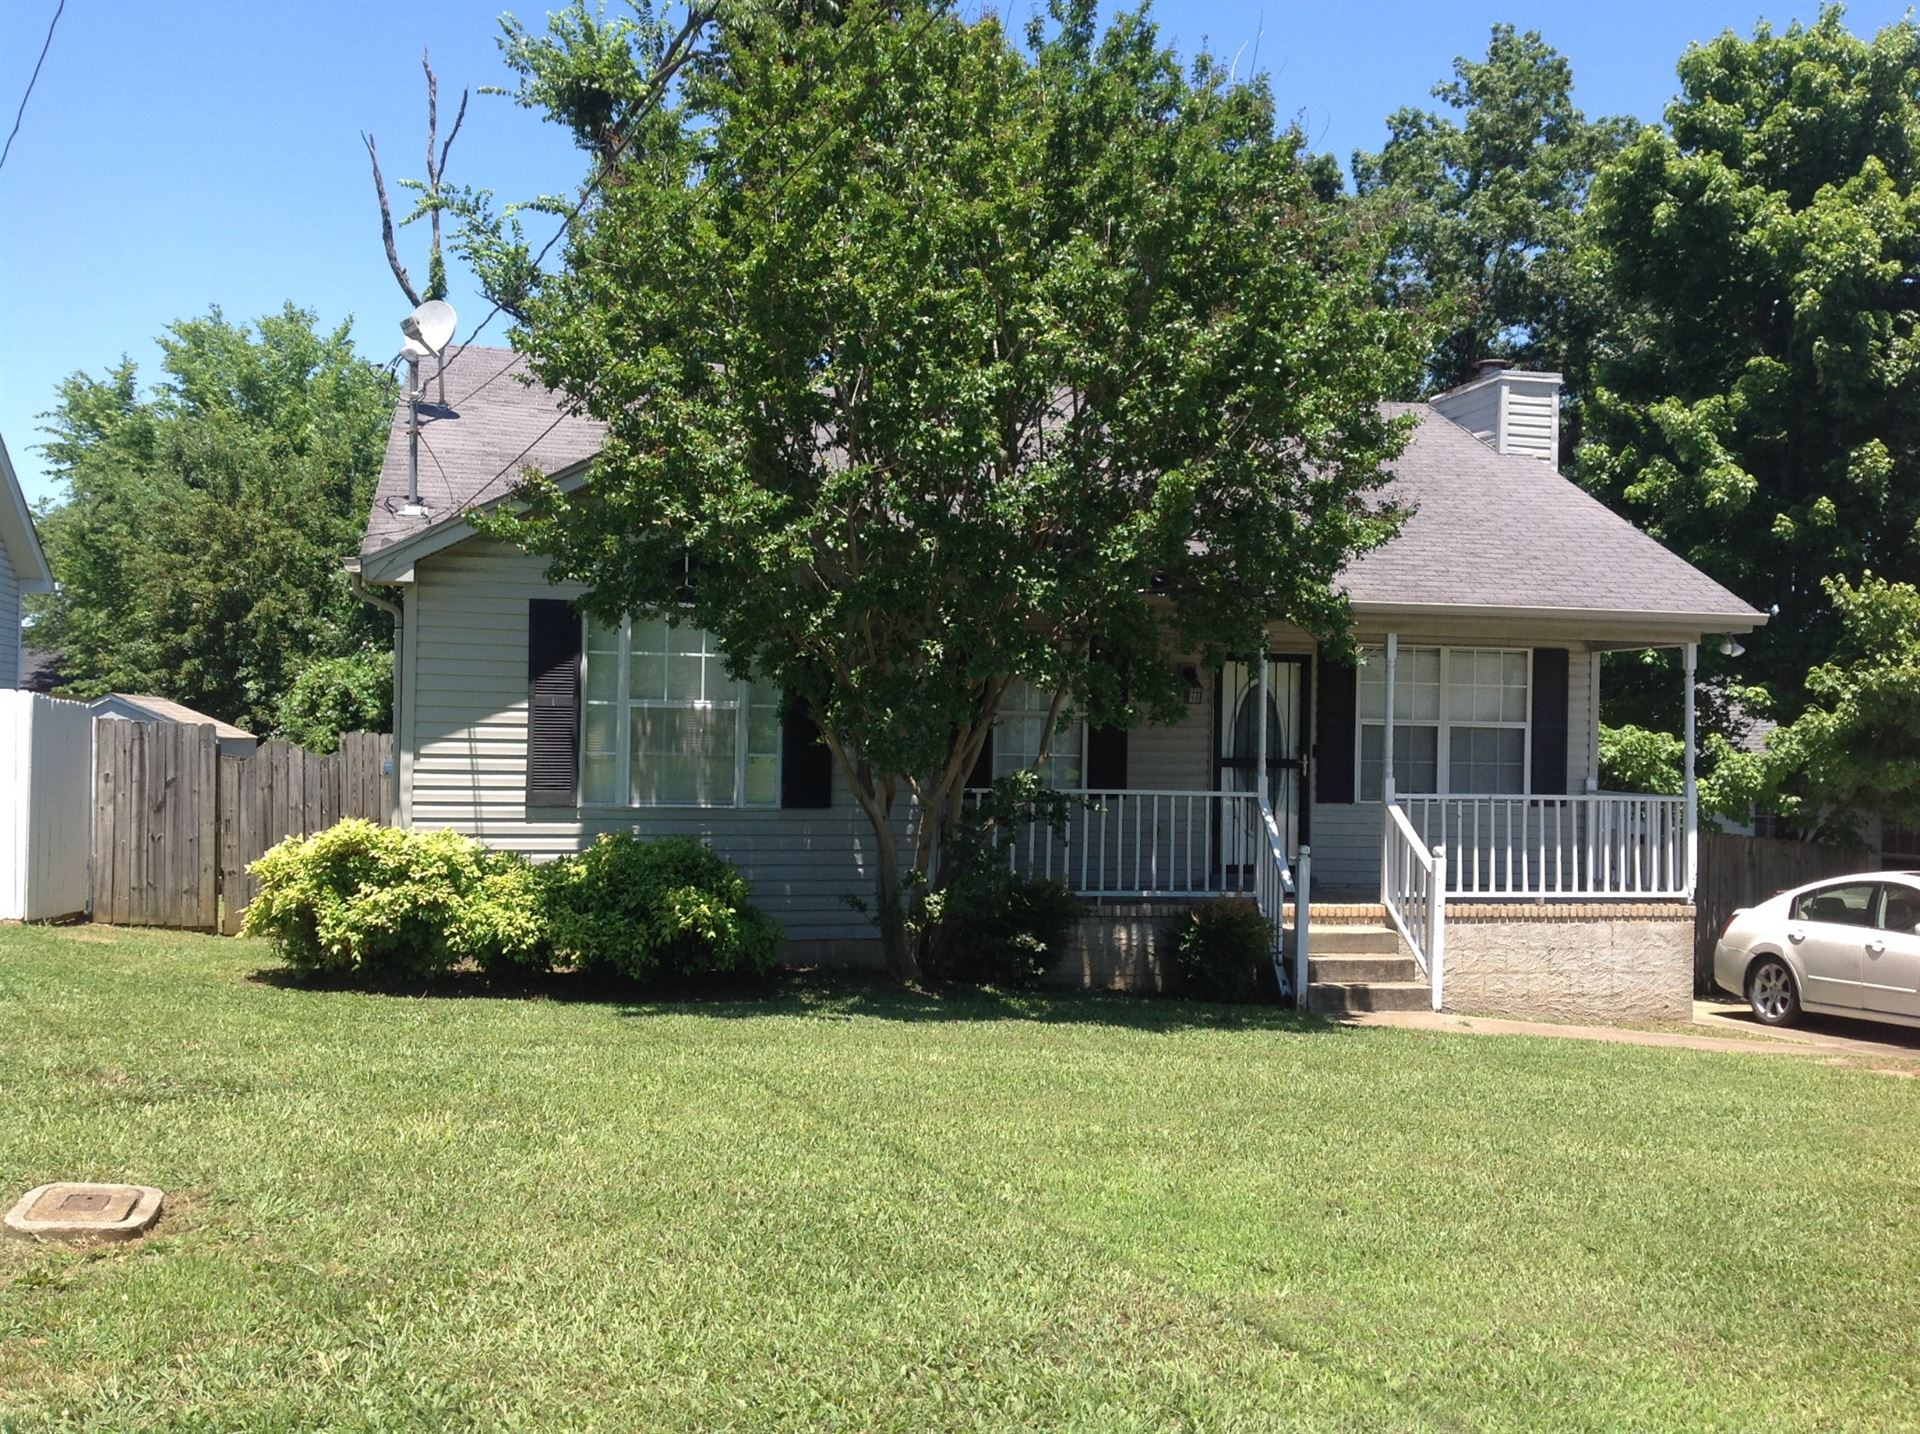 304 Cedar Park Cir, La Vergne, TN 37086 - MLS#: 2263305